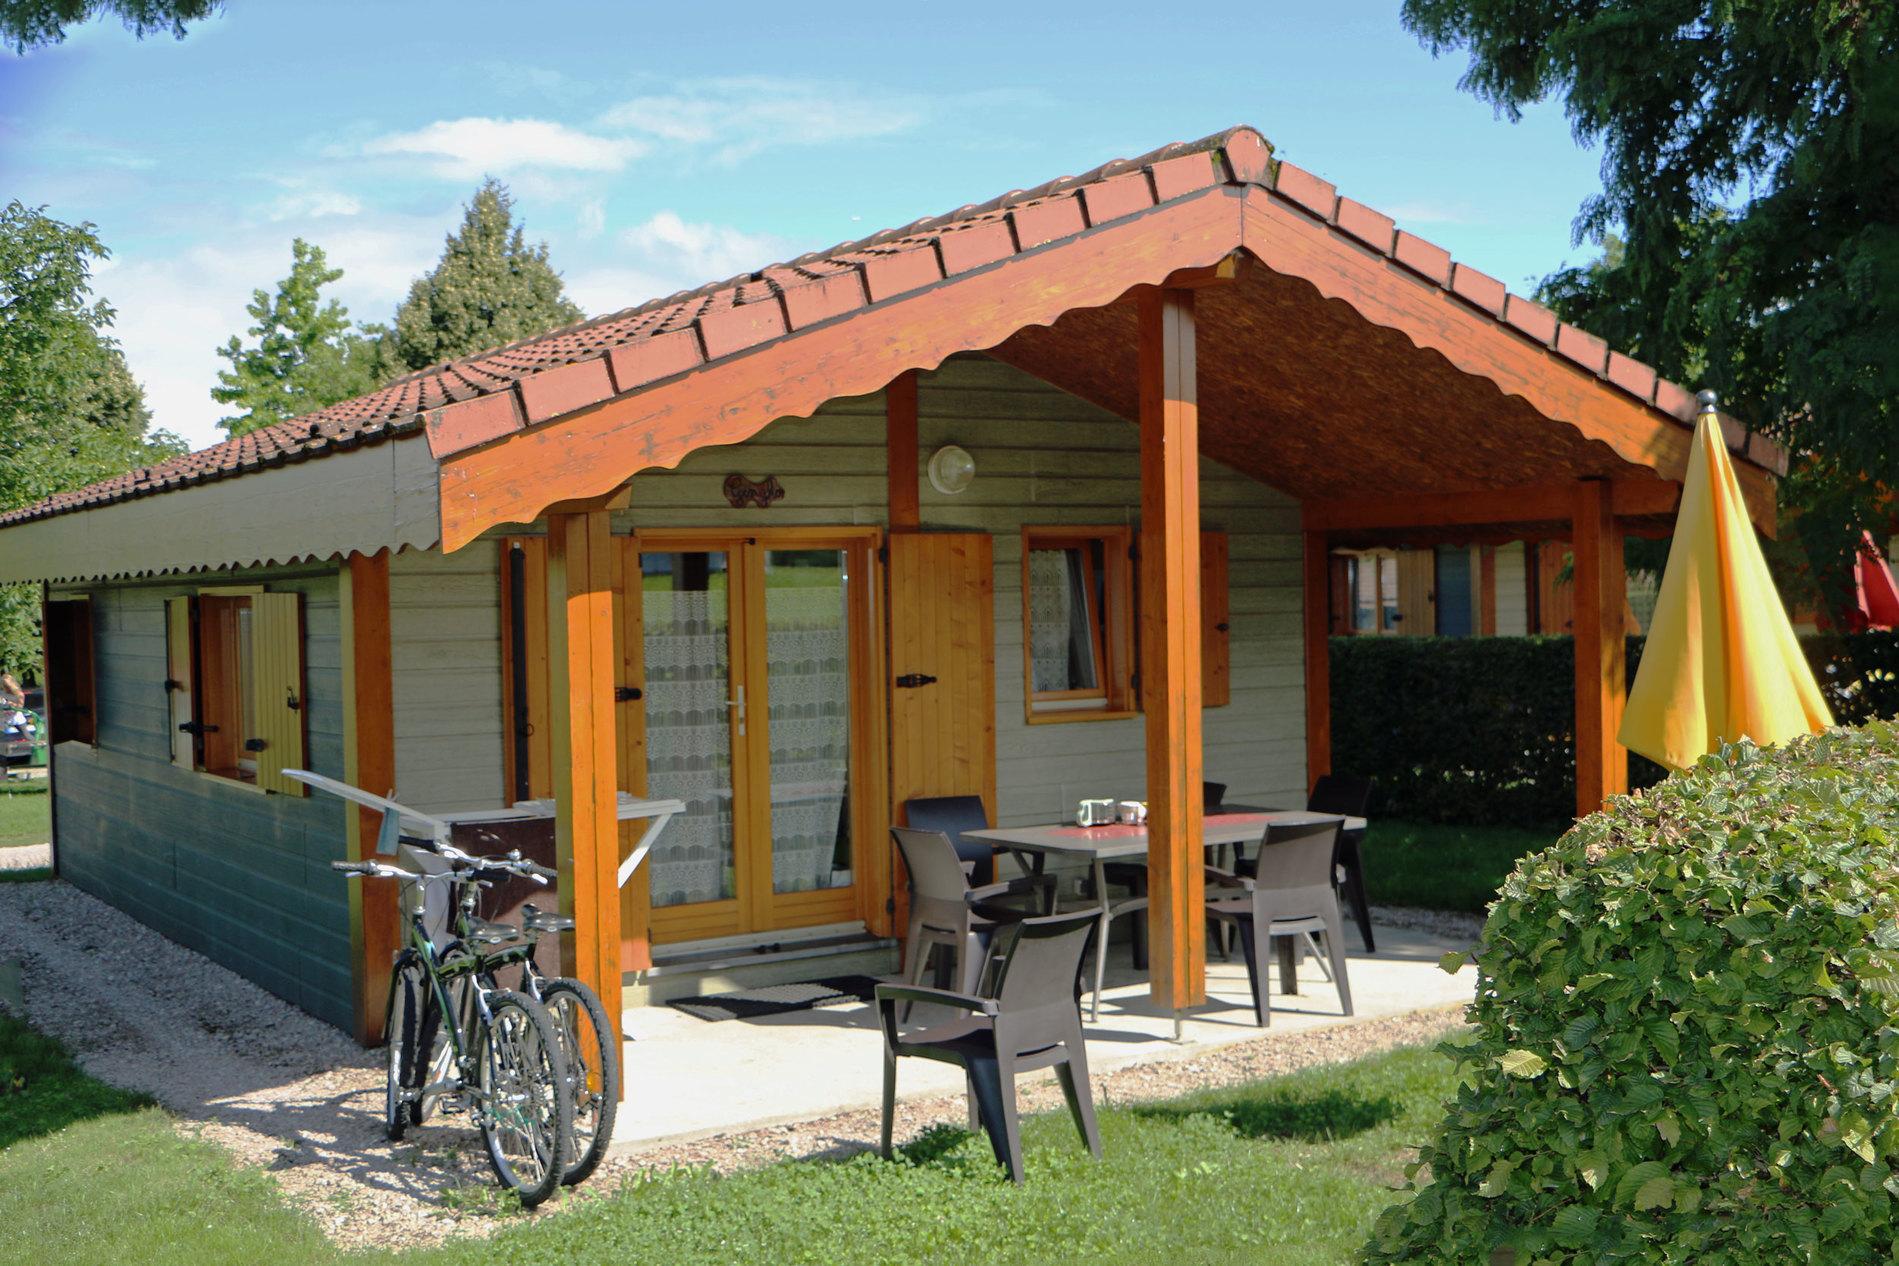 Frankrijk-Sciez-Camping%20Du%20Chatelet-ExtraLarge Wintersport Frankrijk|Pagina 4 van 55